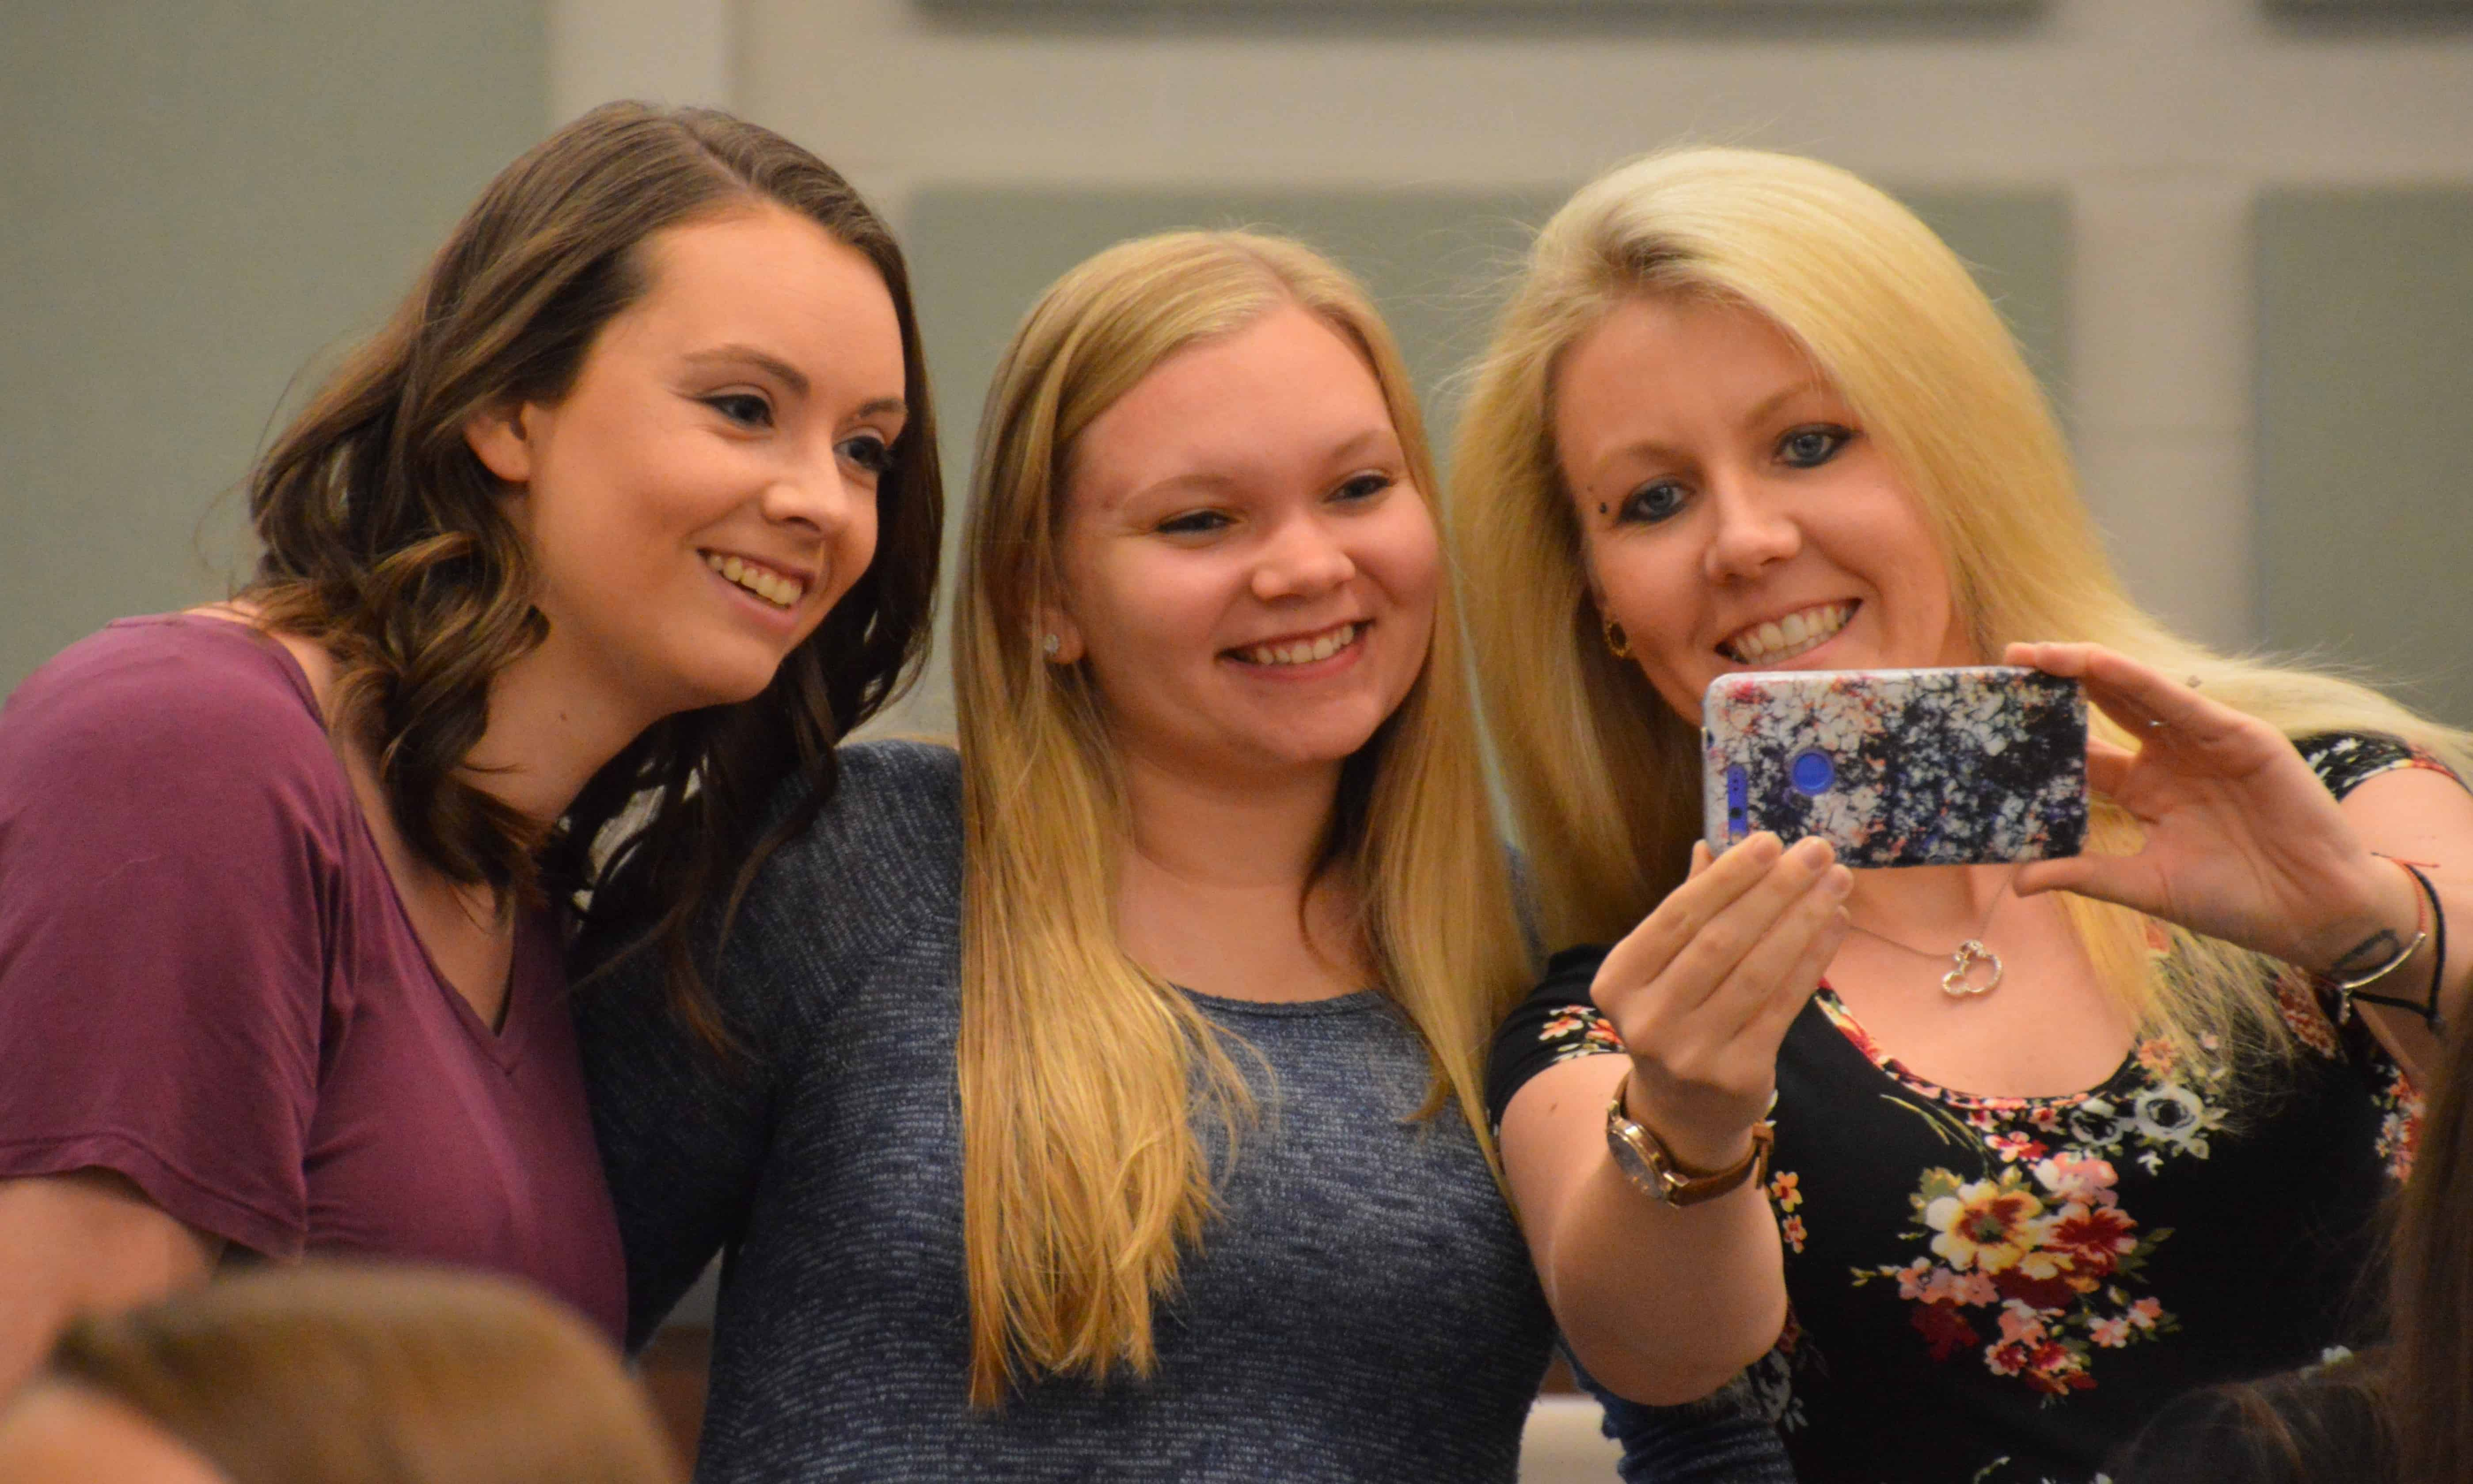 3 smiling female students taking selfie